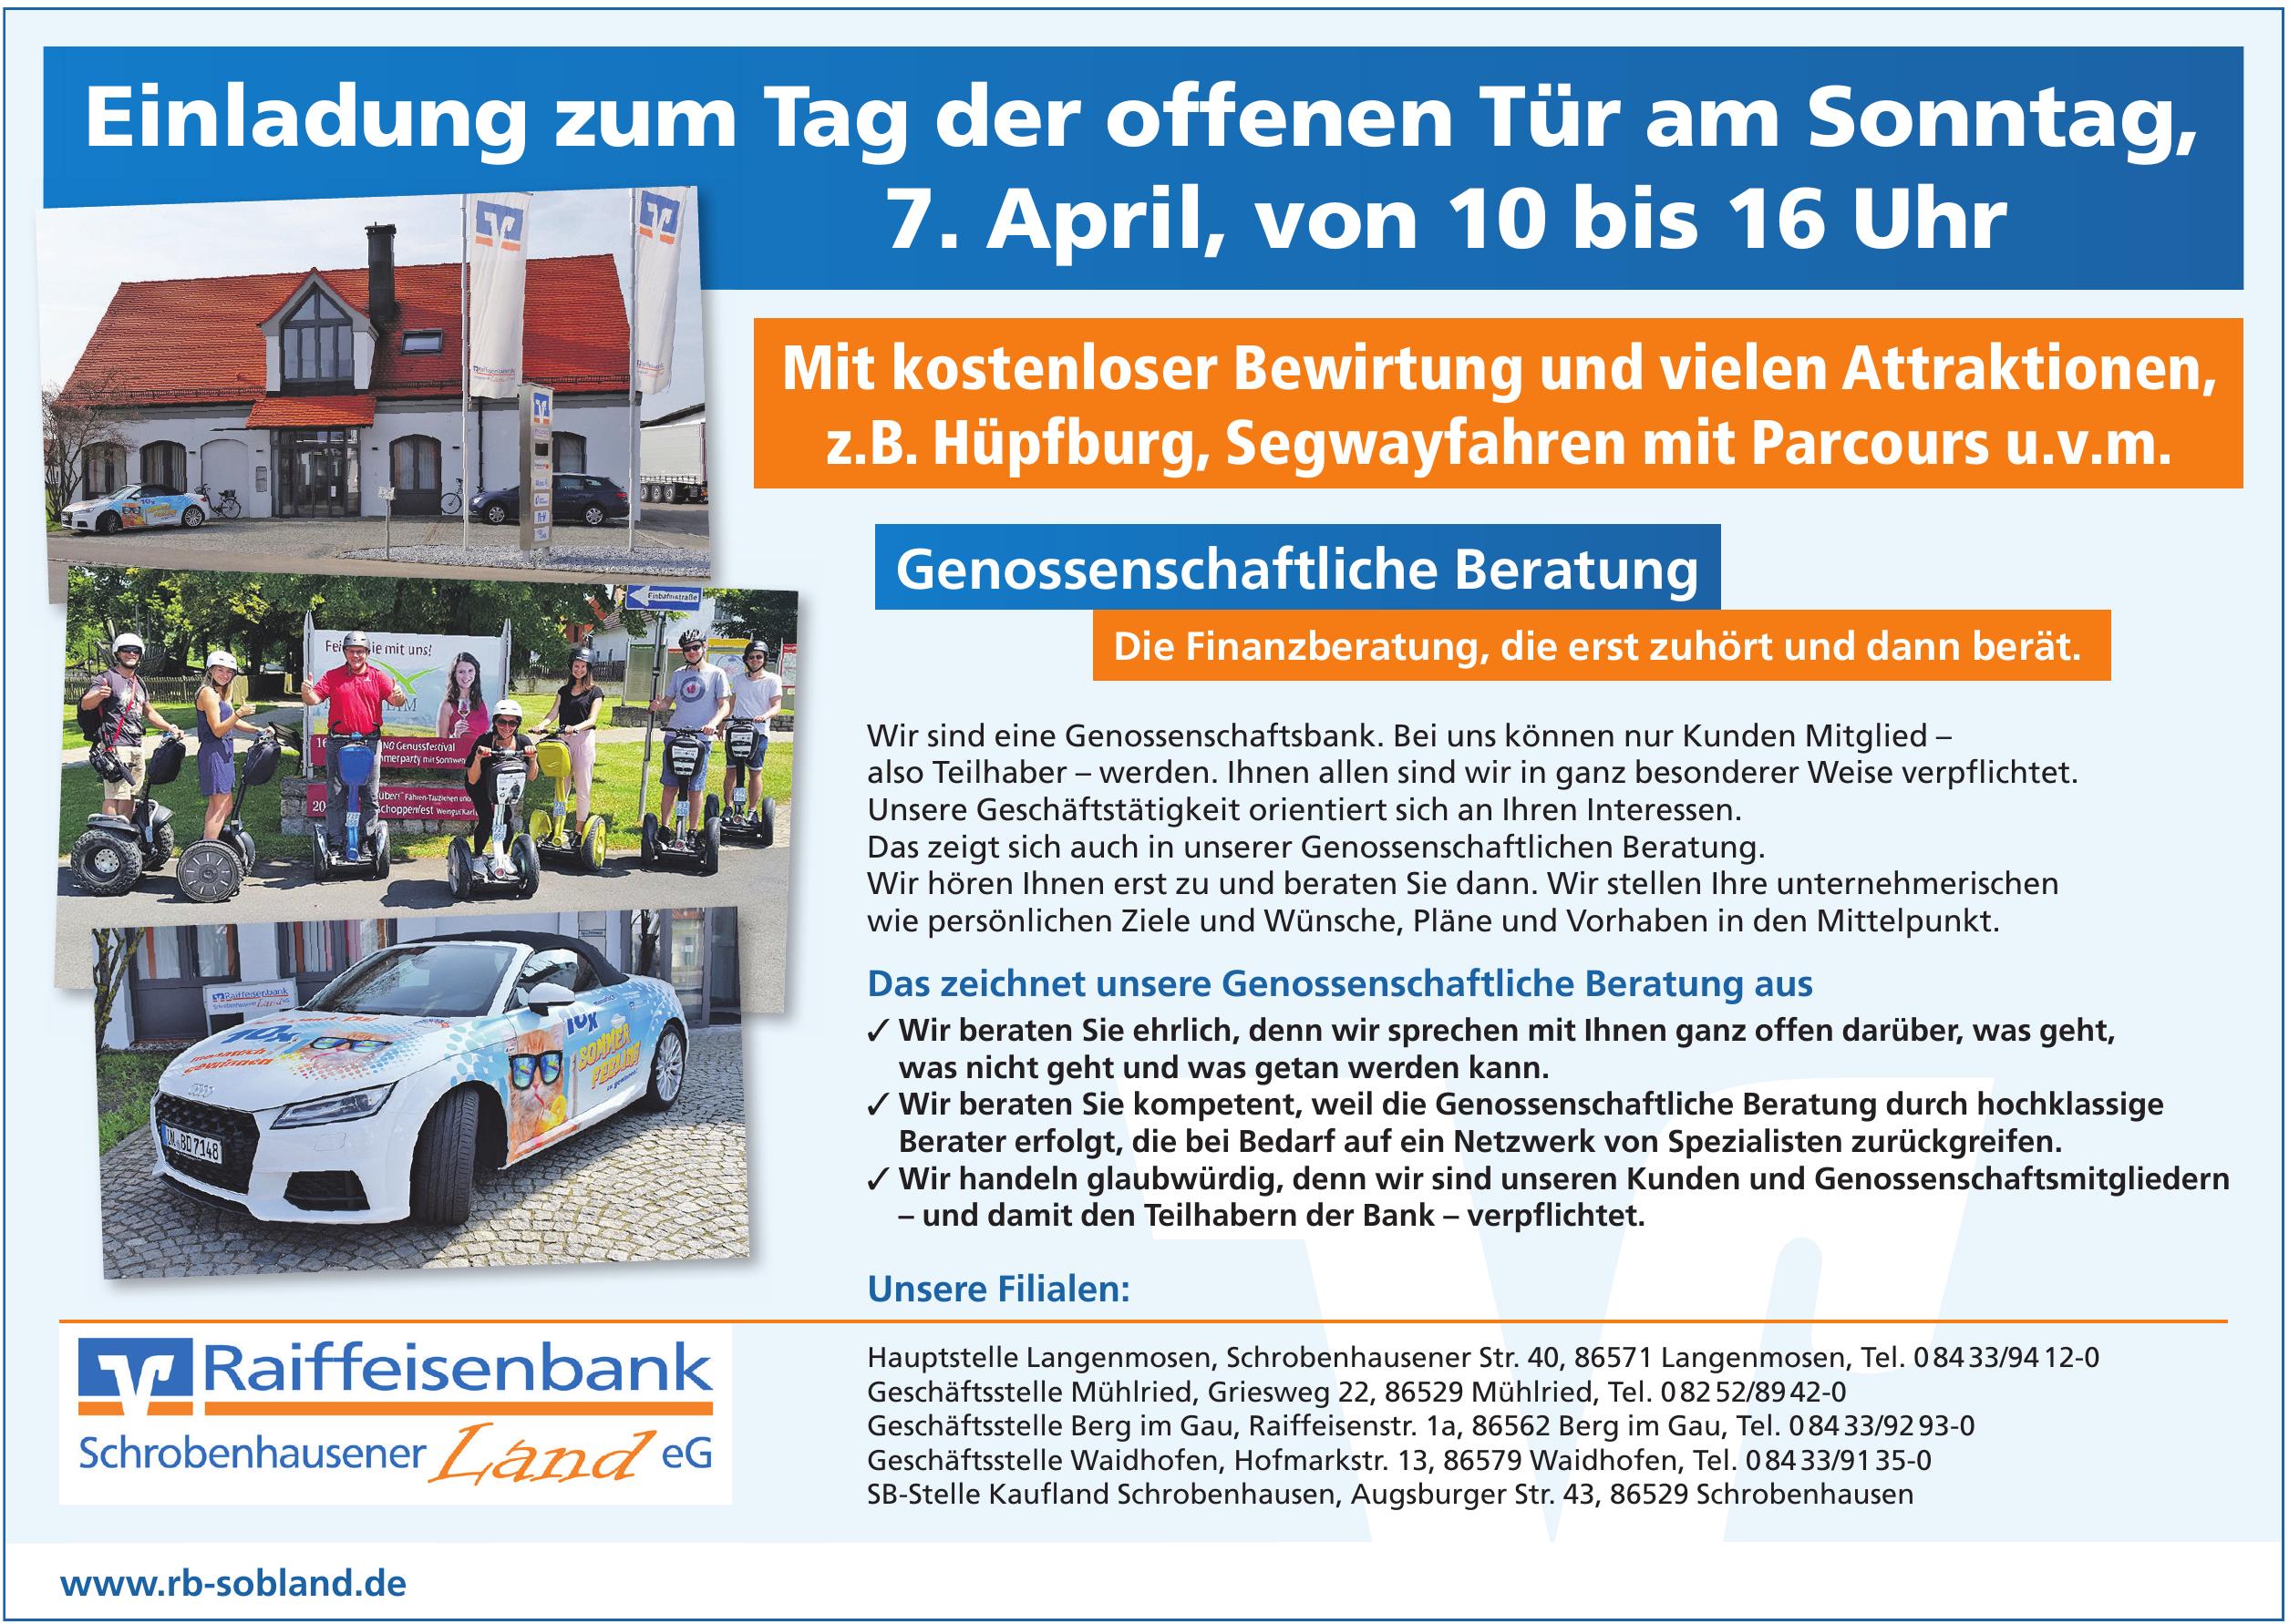 Reiffeisenbank Schrobenhausener Land eG